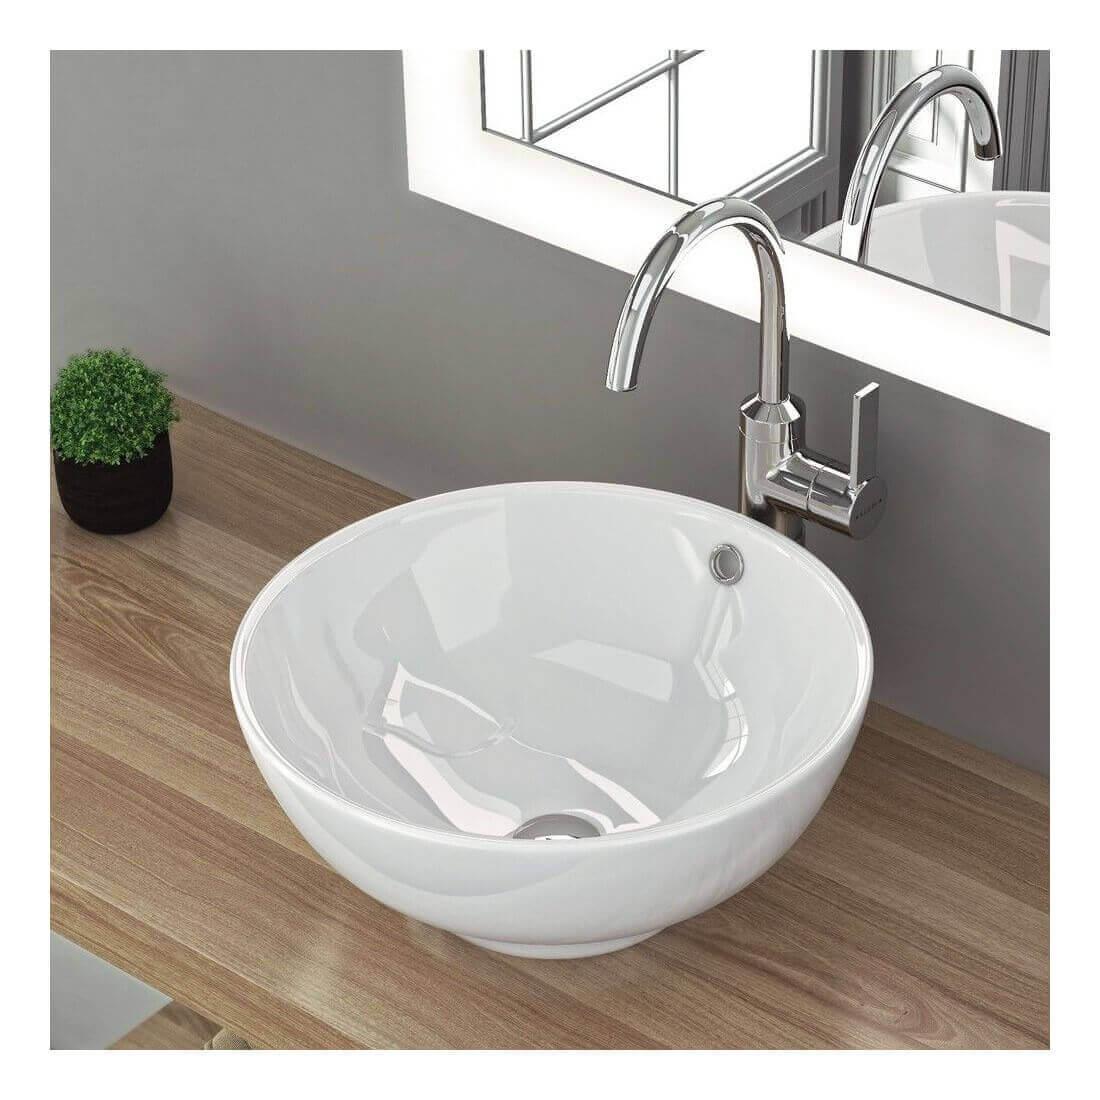 Lavabo sobre encimera aika the bath - Lavabo sobre encimera ...